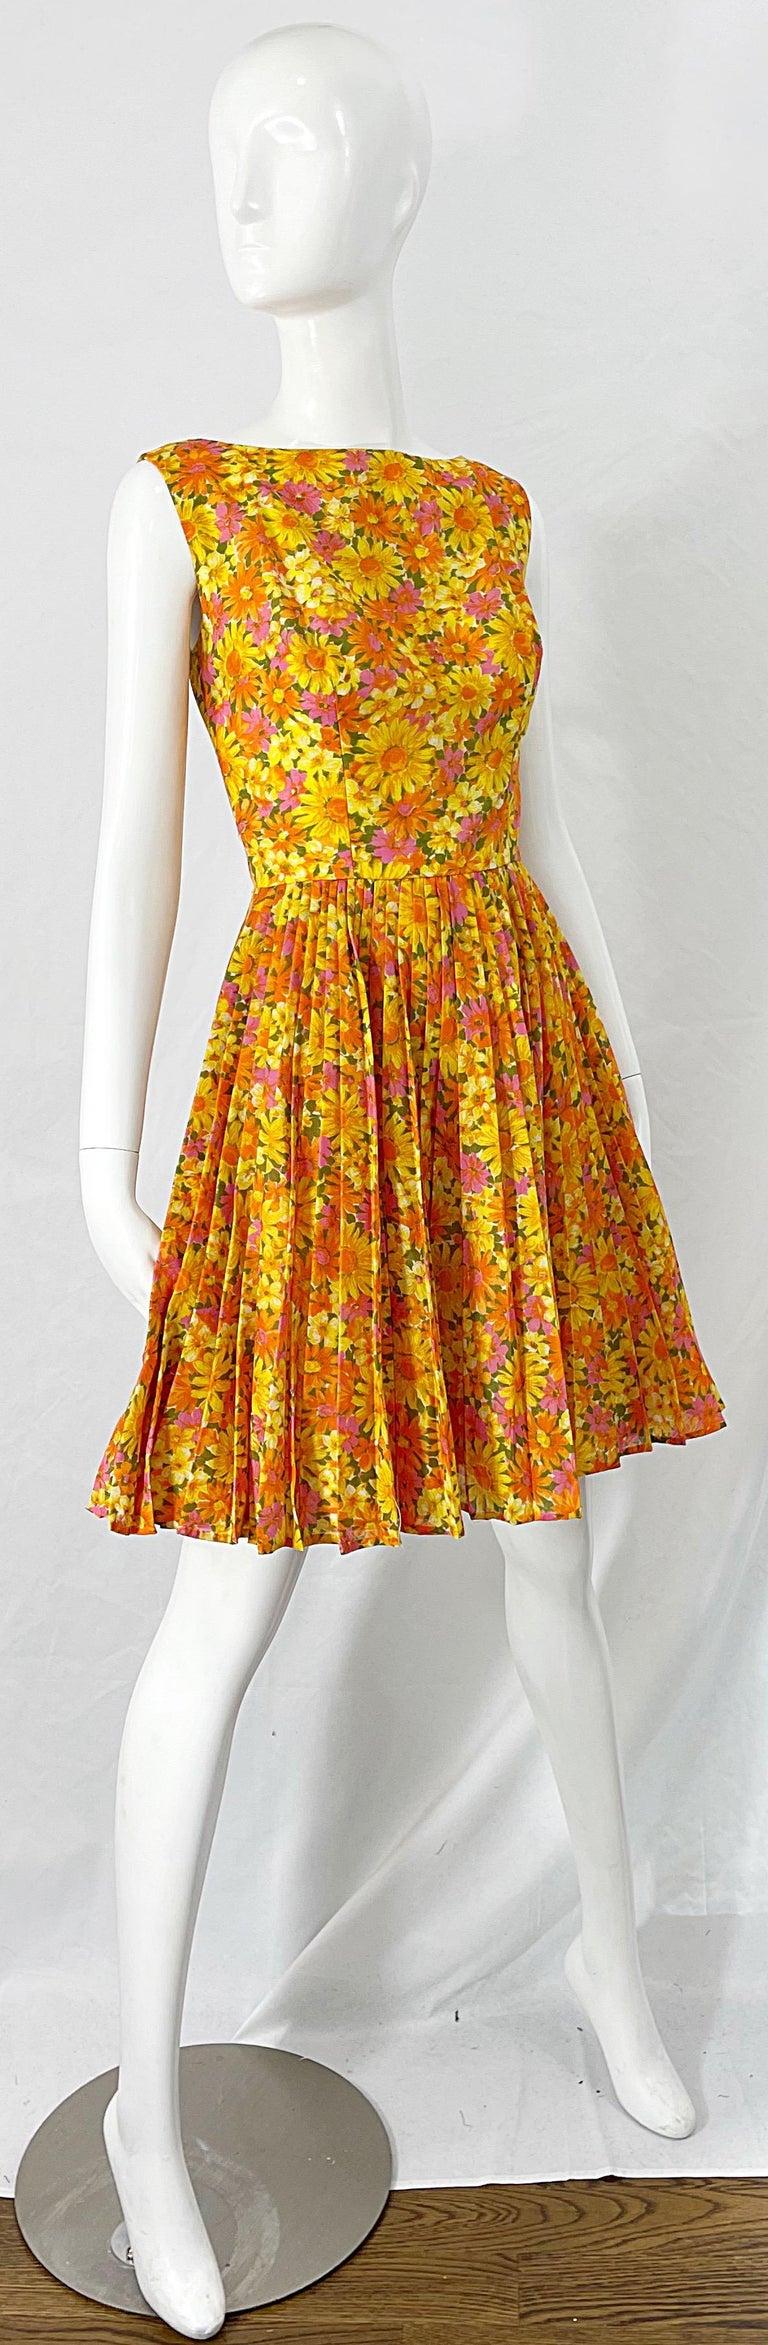 1950s Suzy Perette Yellow Pink Orange Daisy Print Cotton Vintage 50s Dress For Sale 1